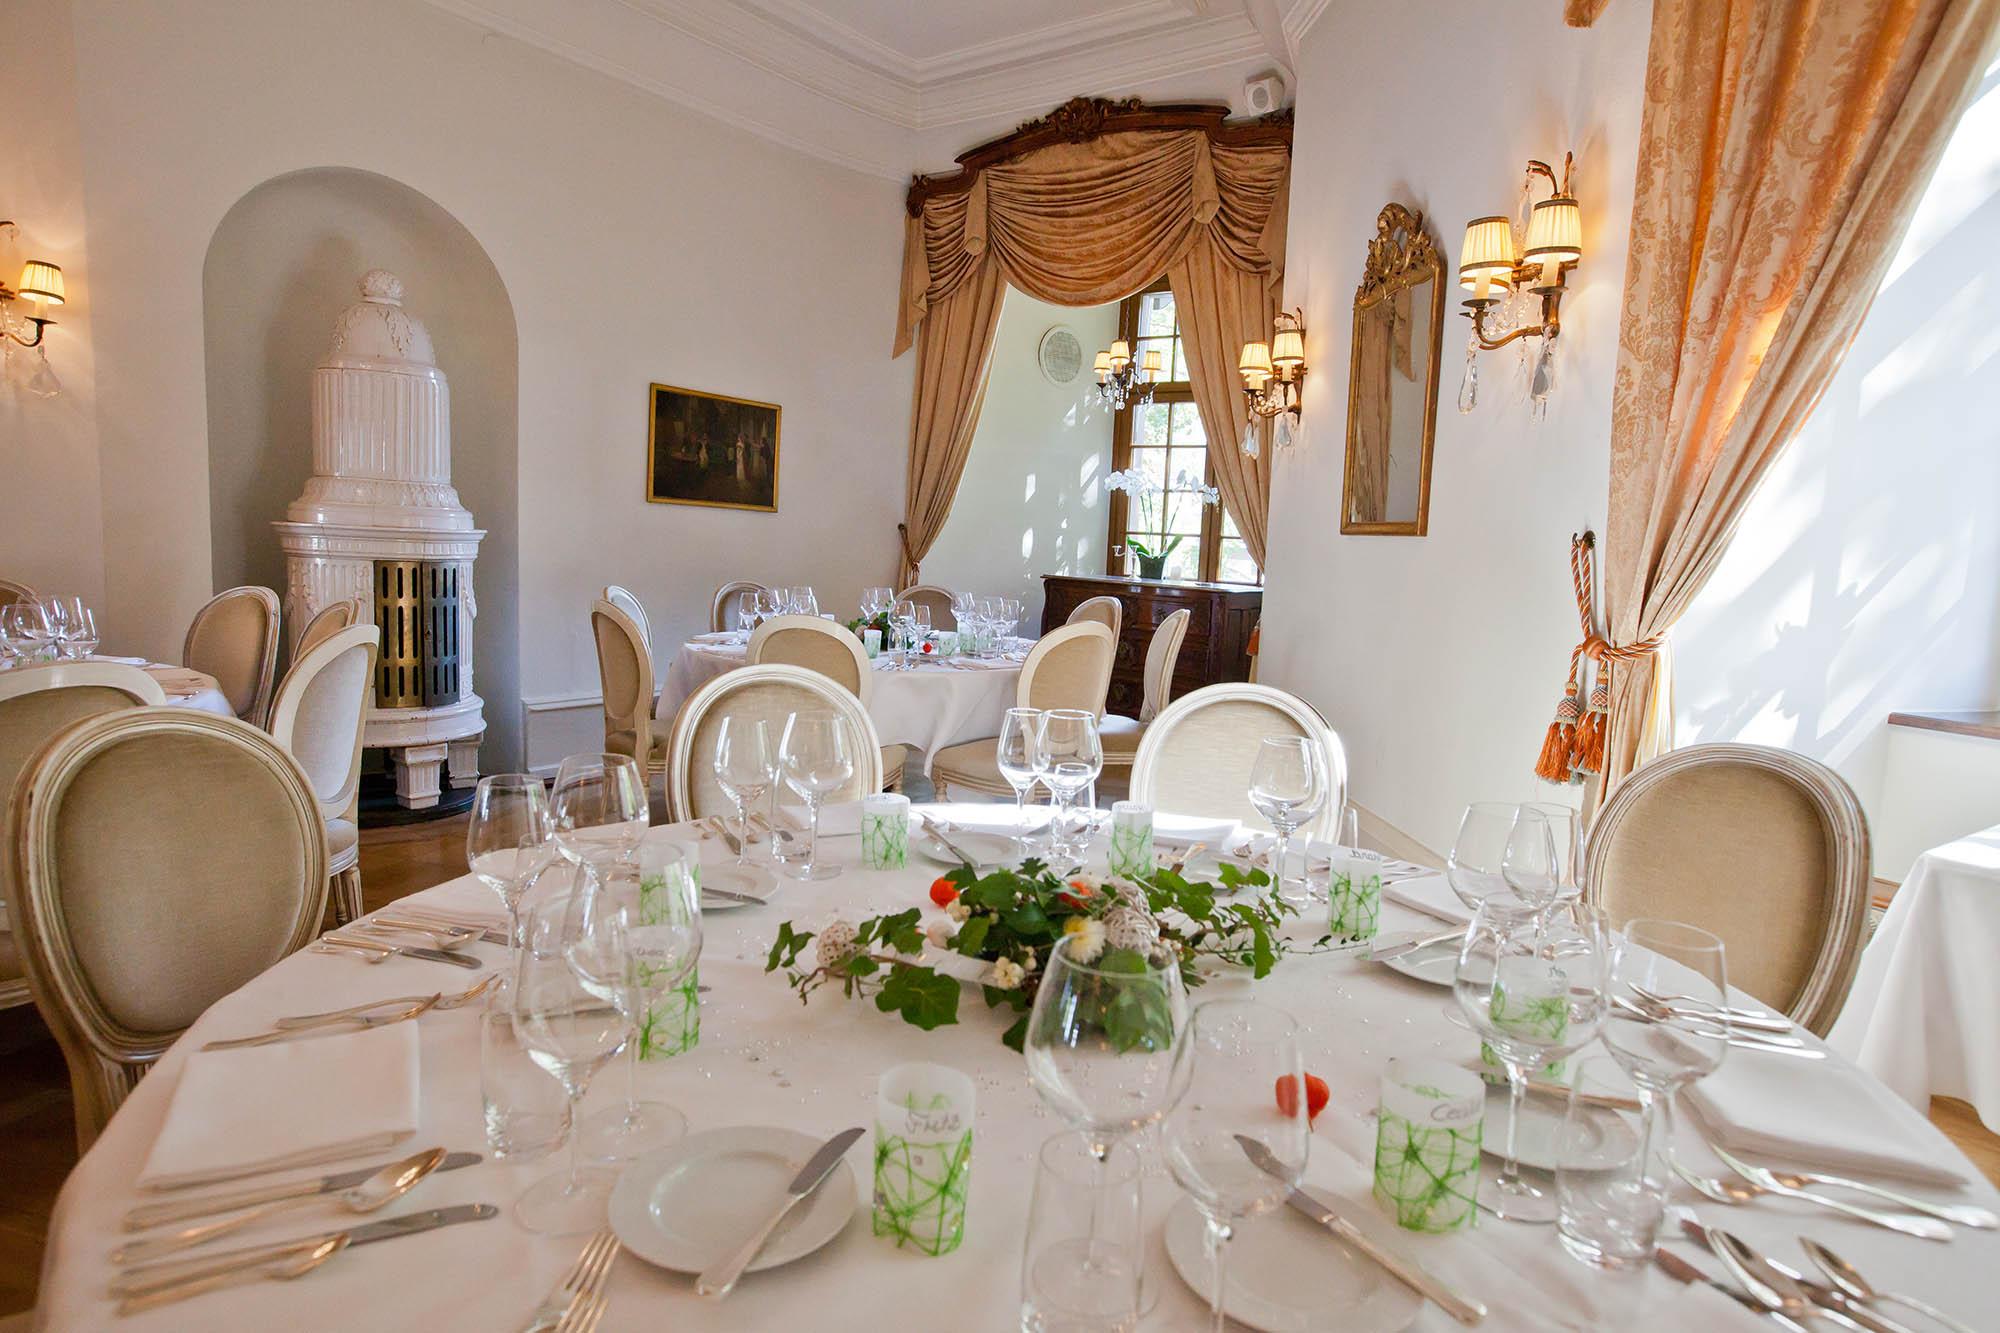 Schloss Binningen Hotel Gourmet Restaurant Binningen